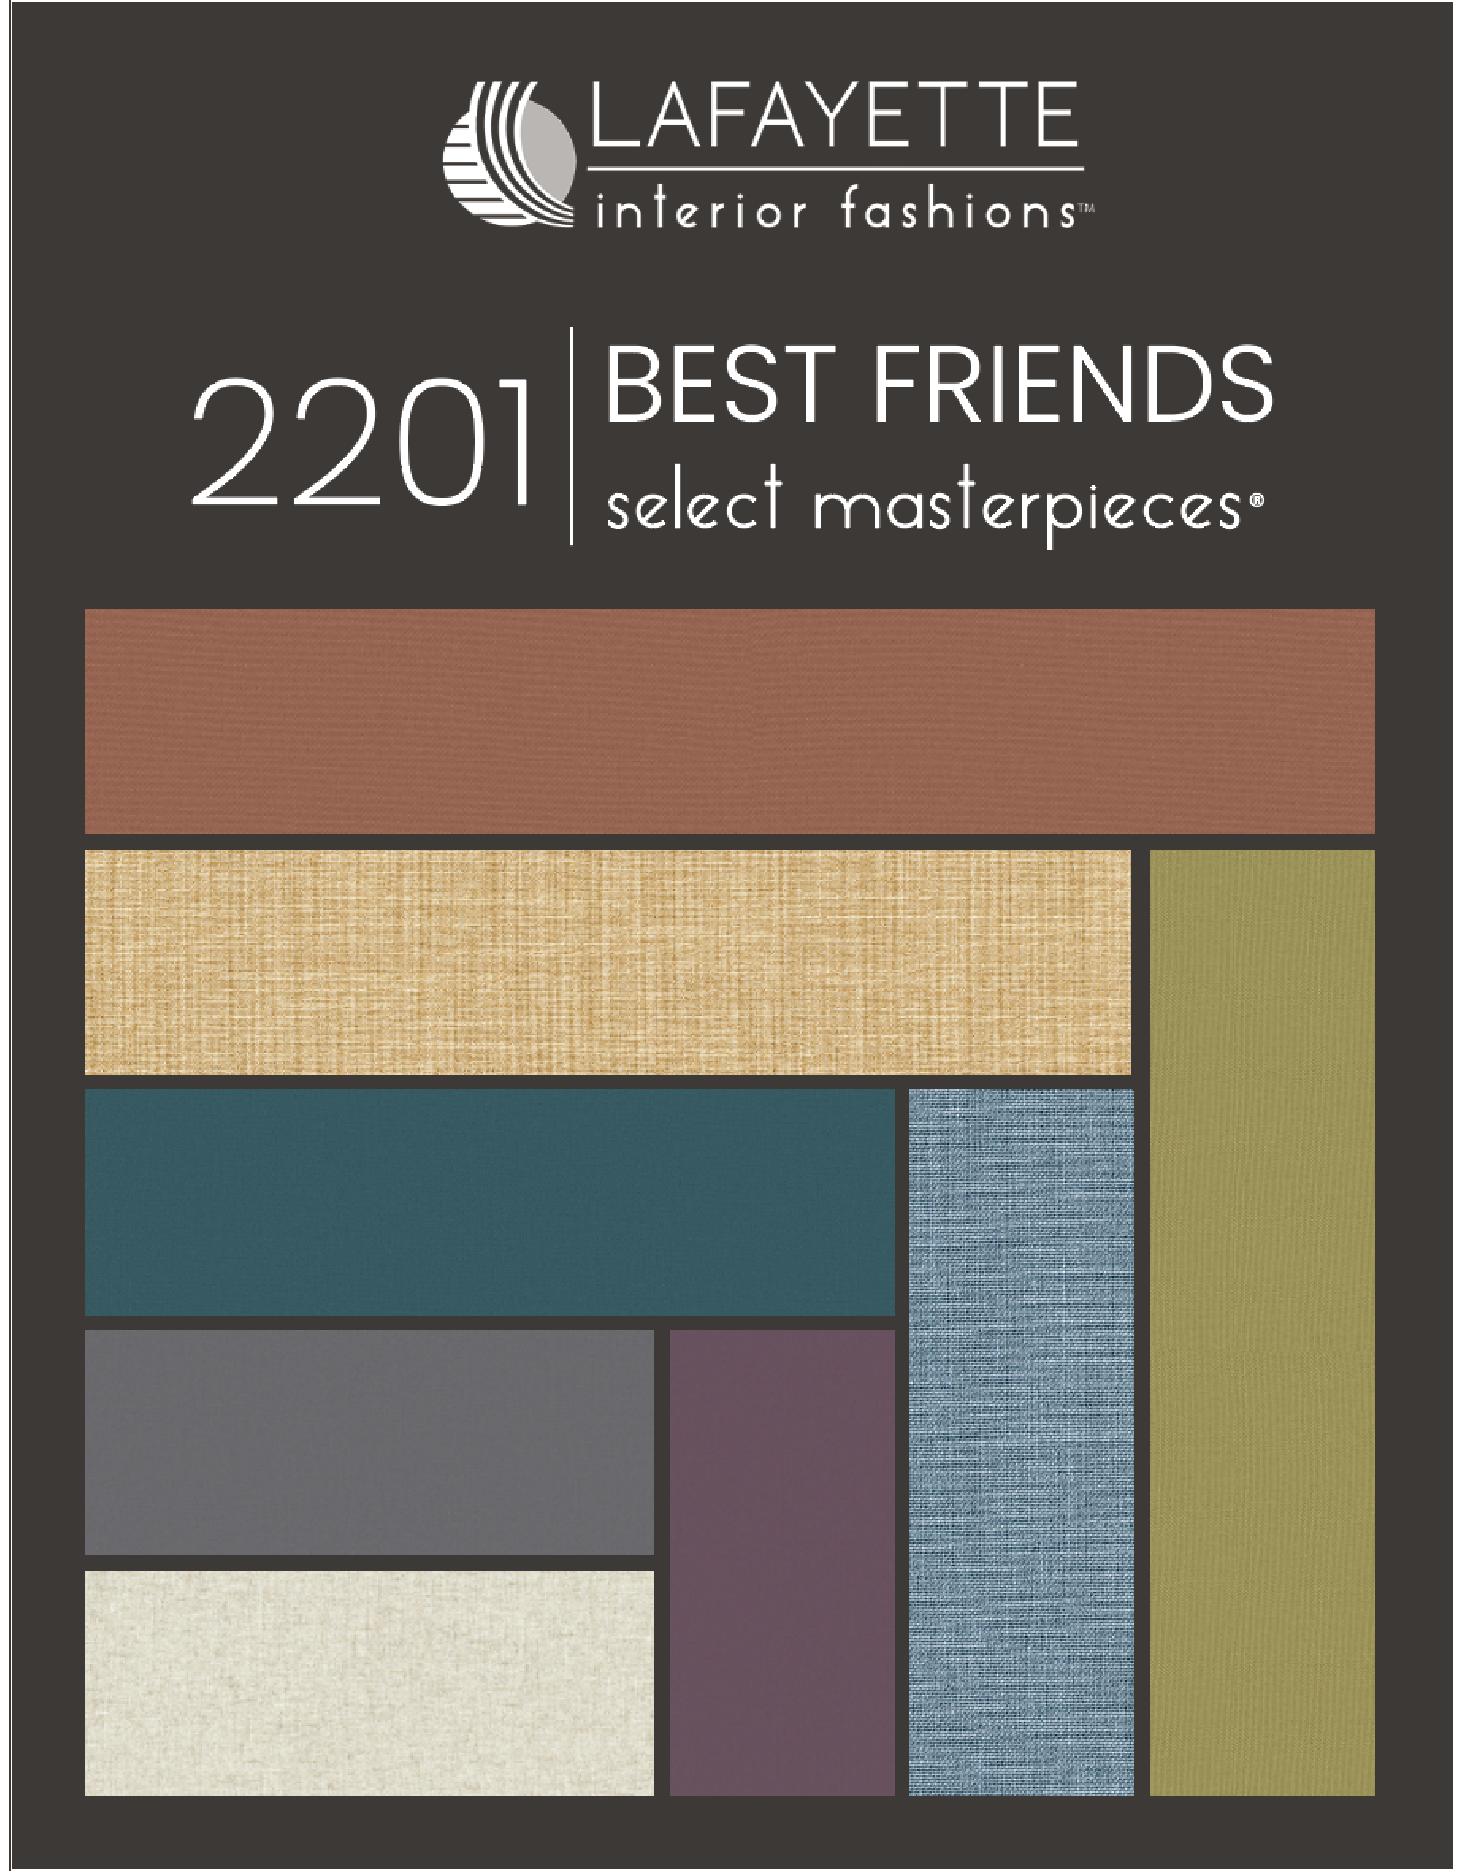 Best Friends 2201